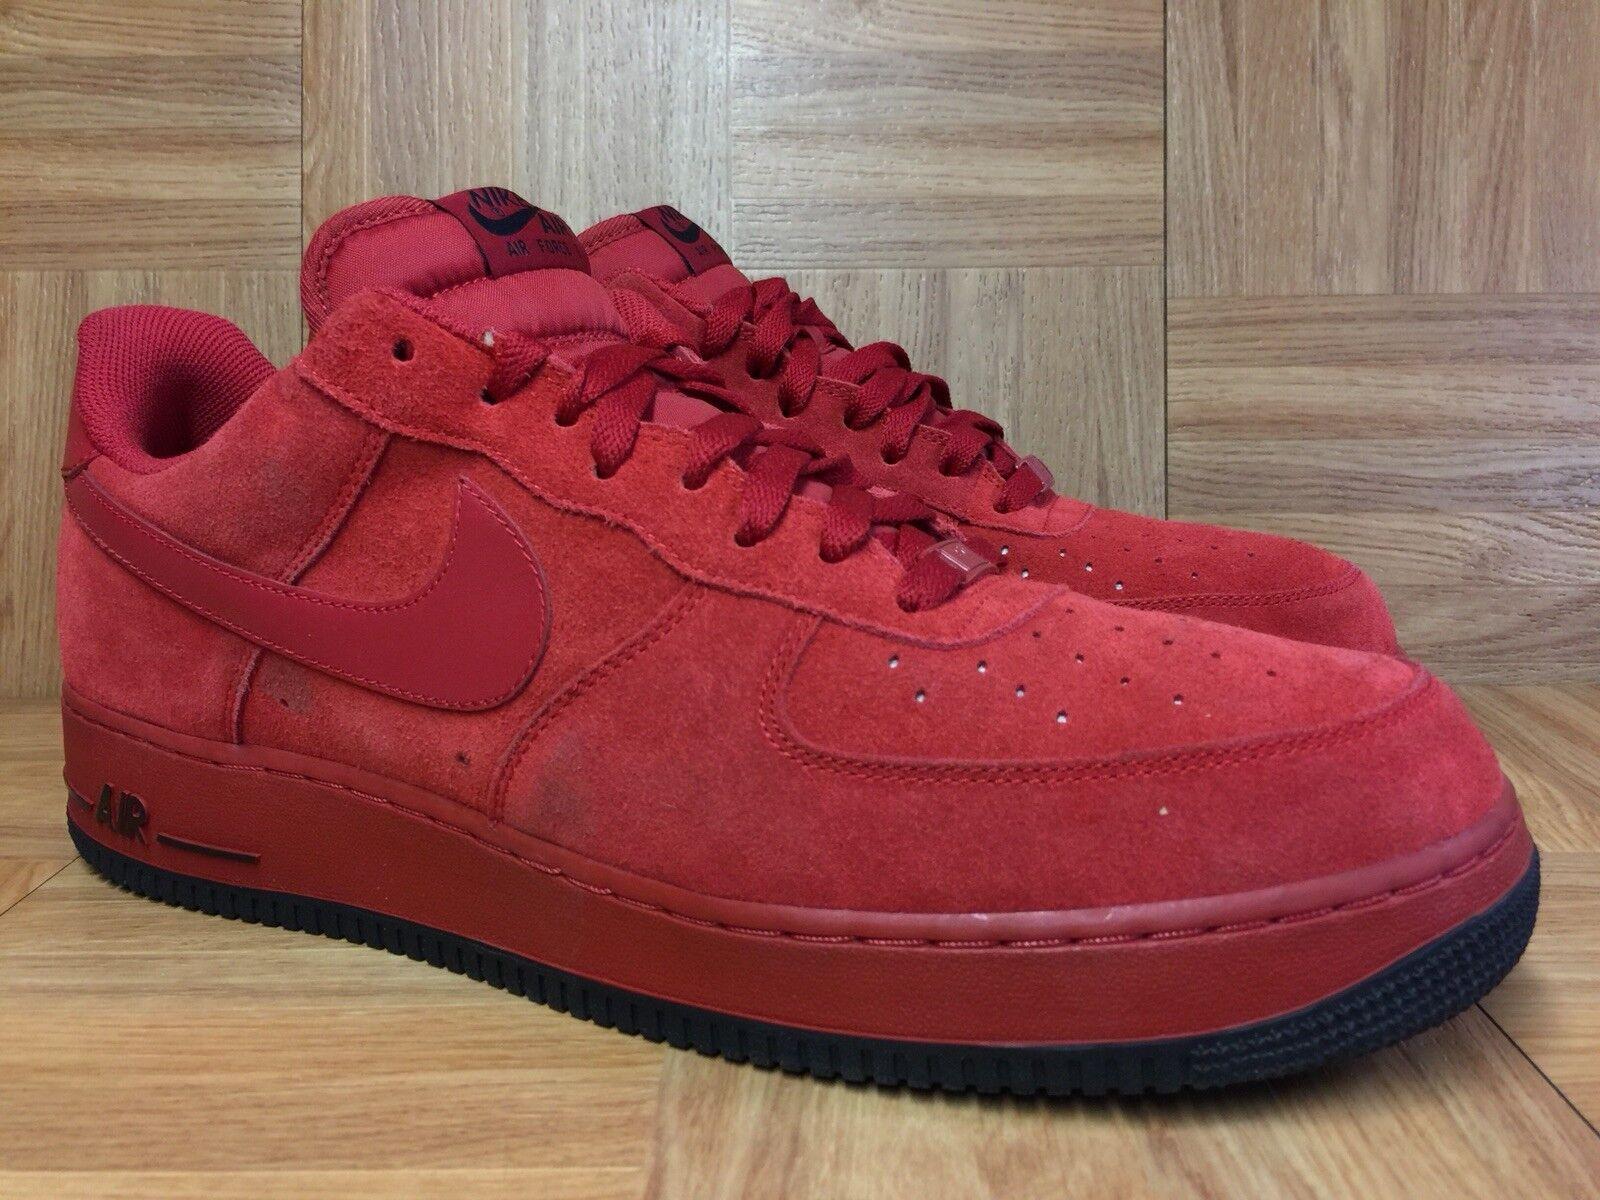 e5679e4b49 RARE Nike Air Force 1 '07 Varsity Red Suede Men's shoes Sz 14 315122-608  noprle8705-Athletic Shoes